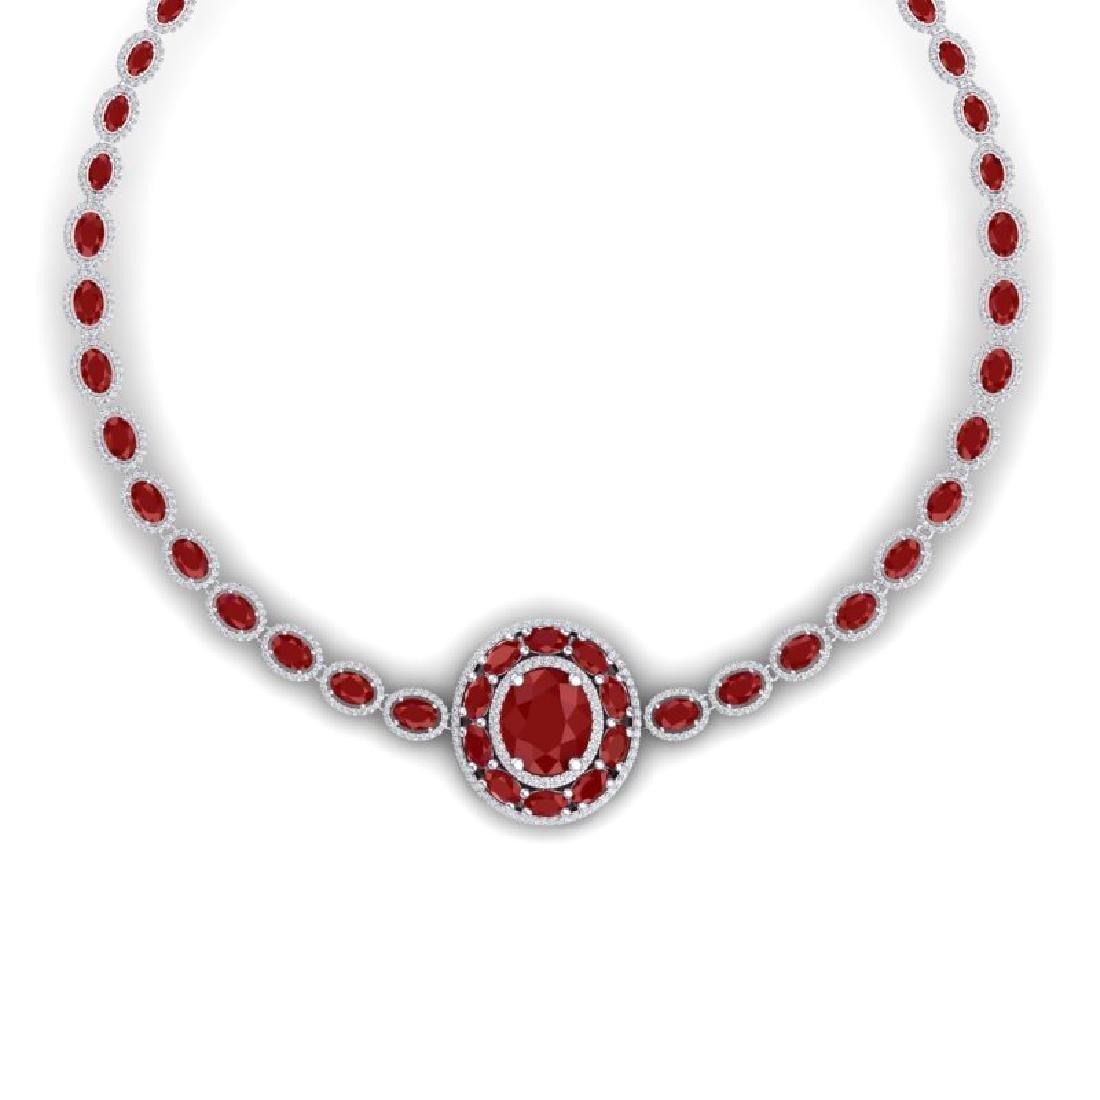 43.54 CTW Royalty Ruby & VS Diamond Necklace 18K White - 2